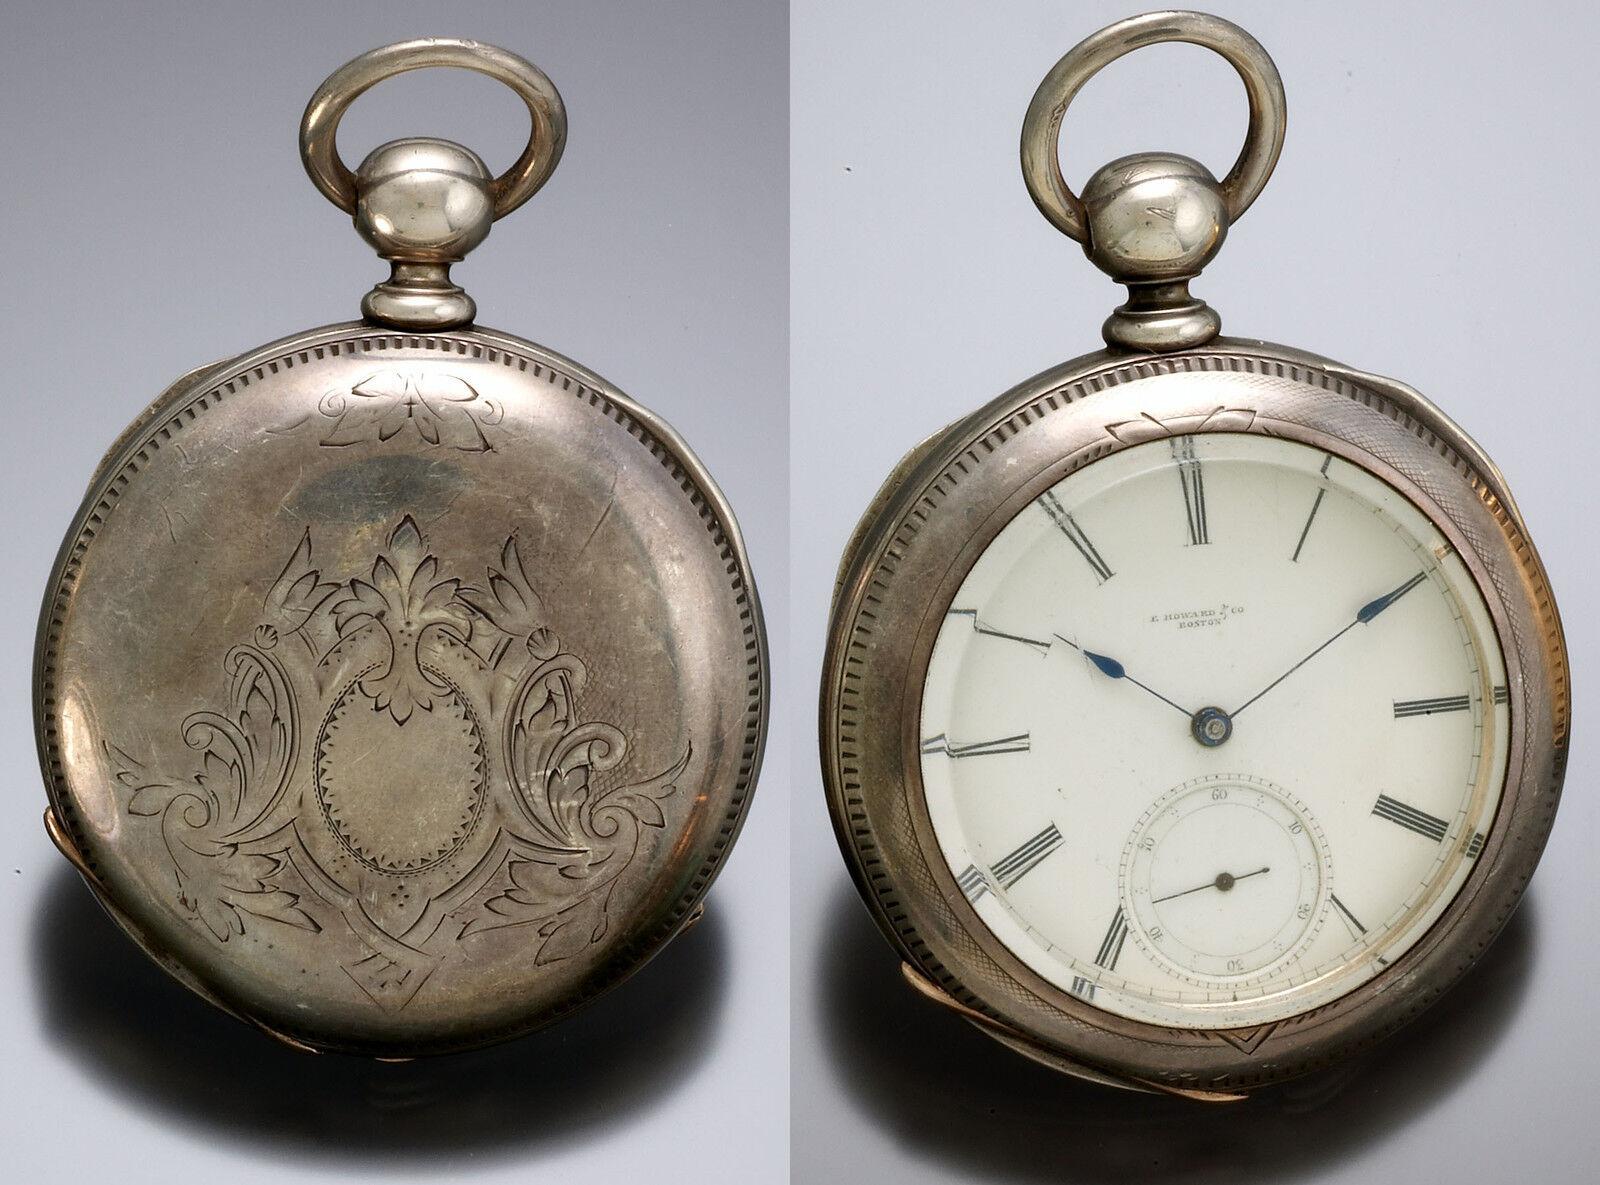 SERIES II HOWARD POCKET WATCH IN 4 OZ COIN SILVER CASE WITH FOLIATE PATTERN 1861